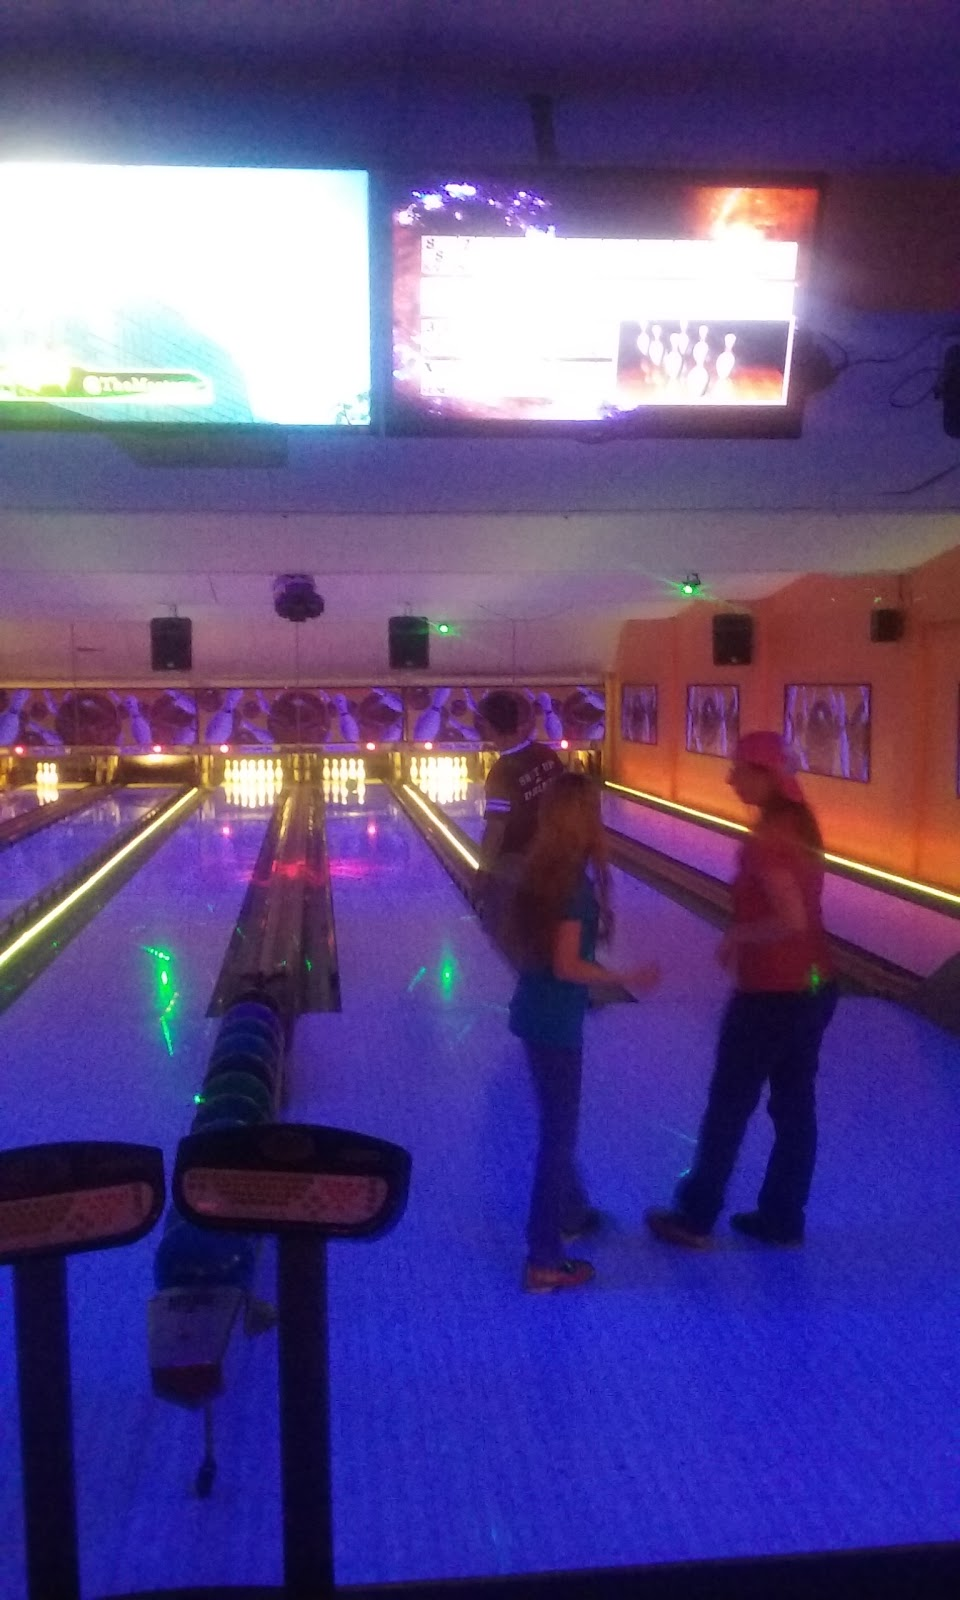 Lake Street Lanes - bowling alley  | Photo 1 of 10 | Address: 10 Lake St, New Berlin, NY 13411, USA | Phone: (607) 847-8594